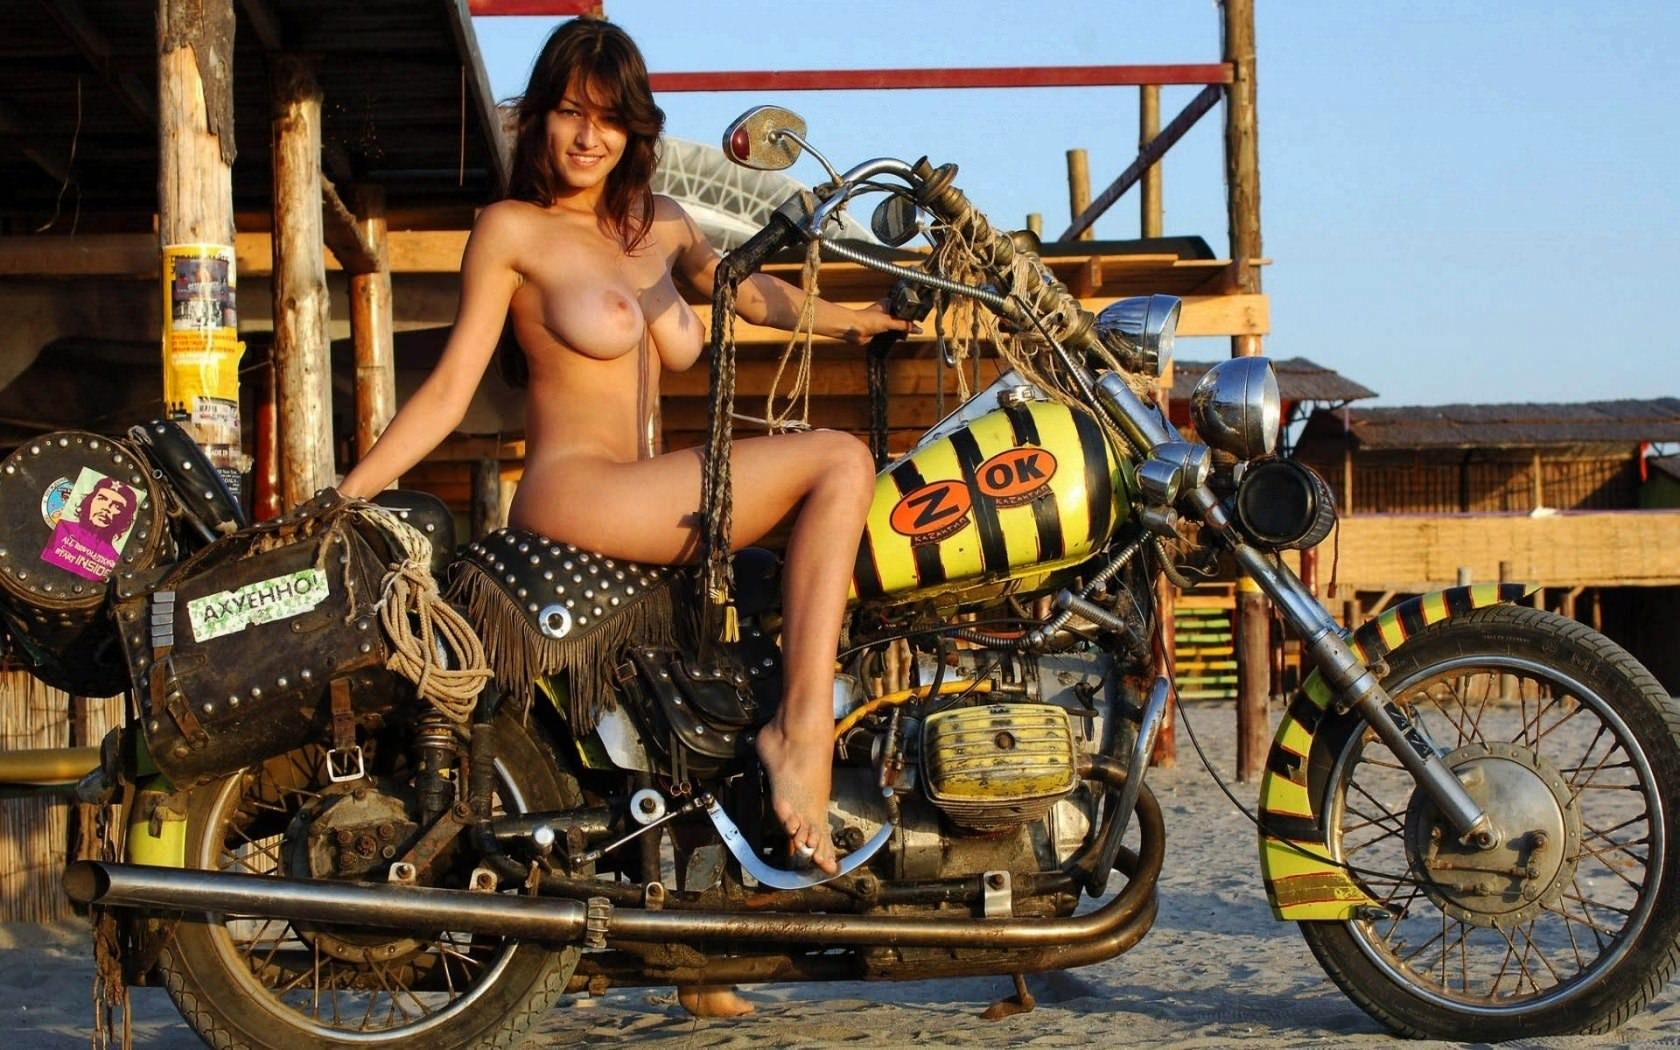 Girls riding motorcycles naked